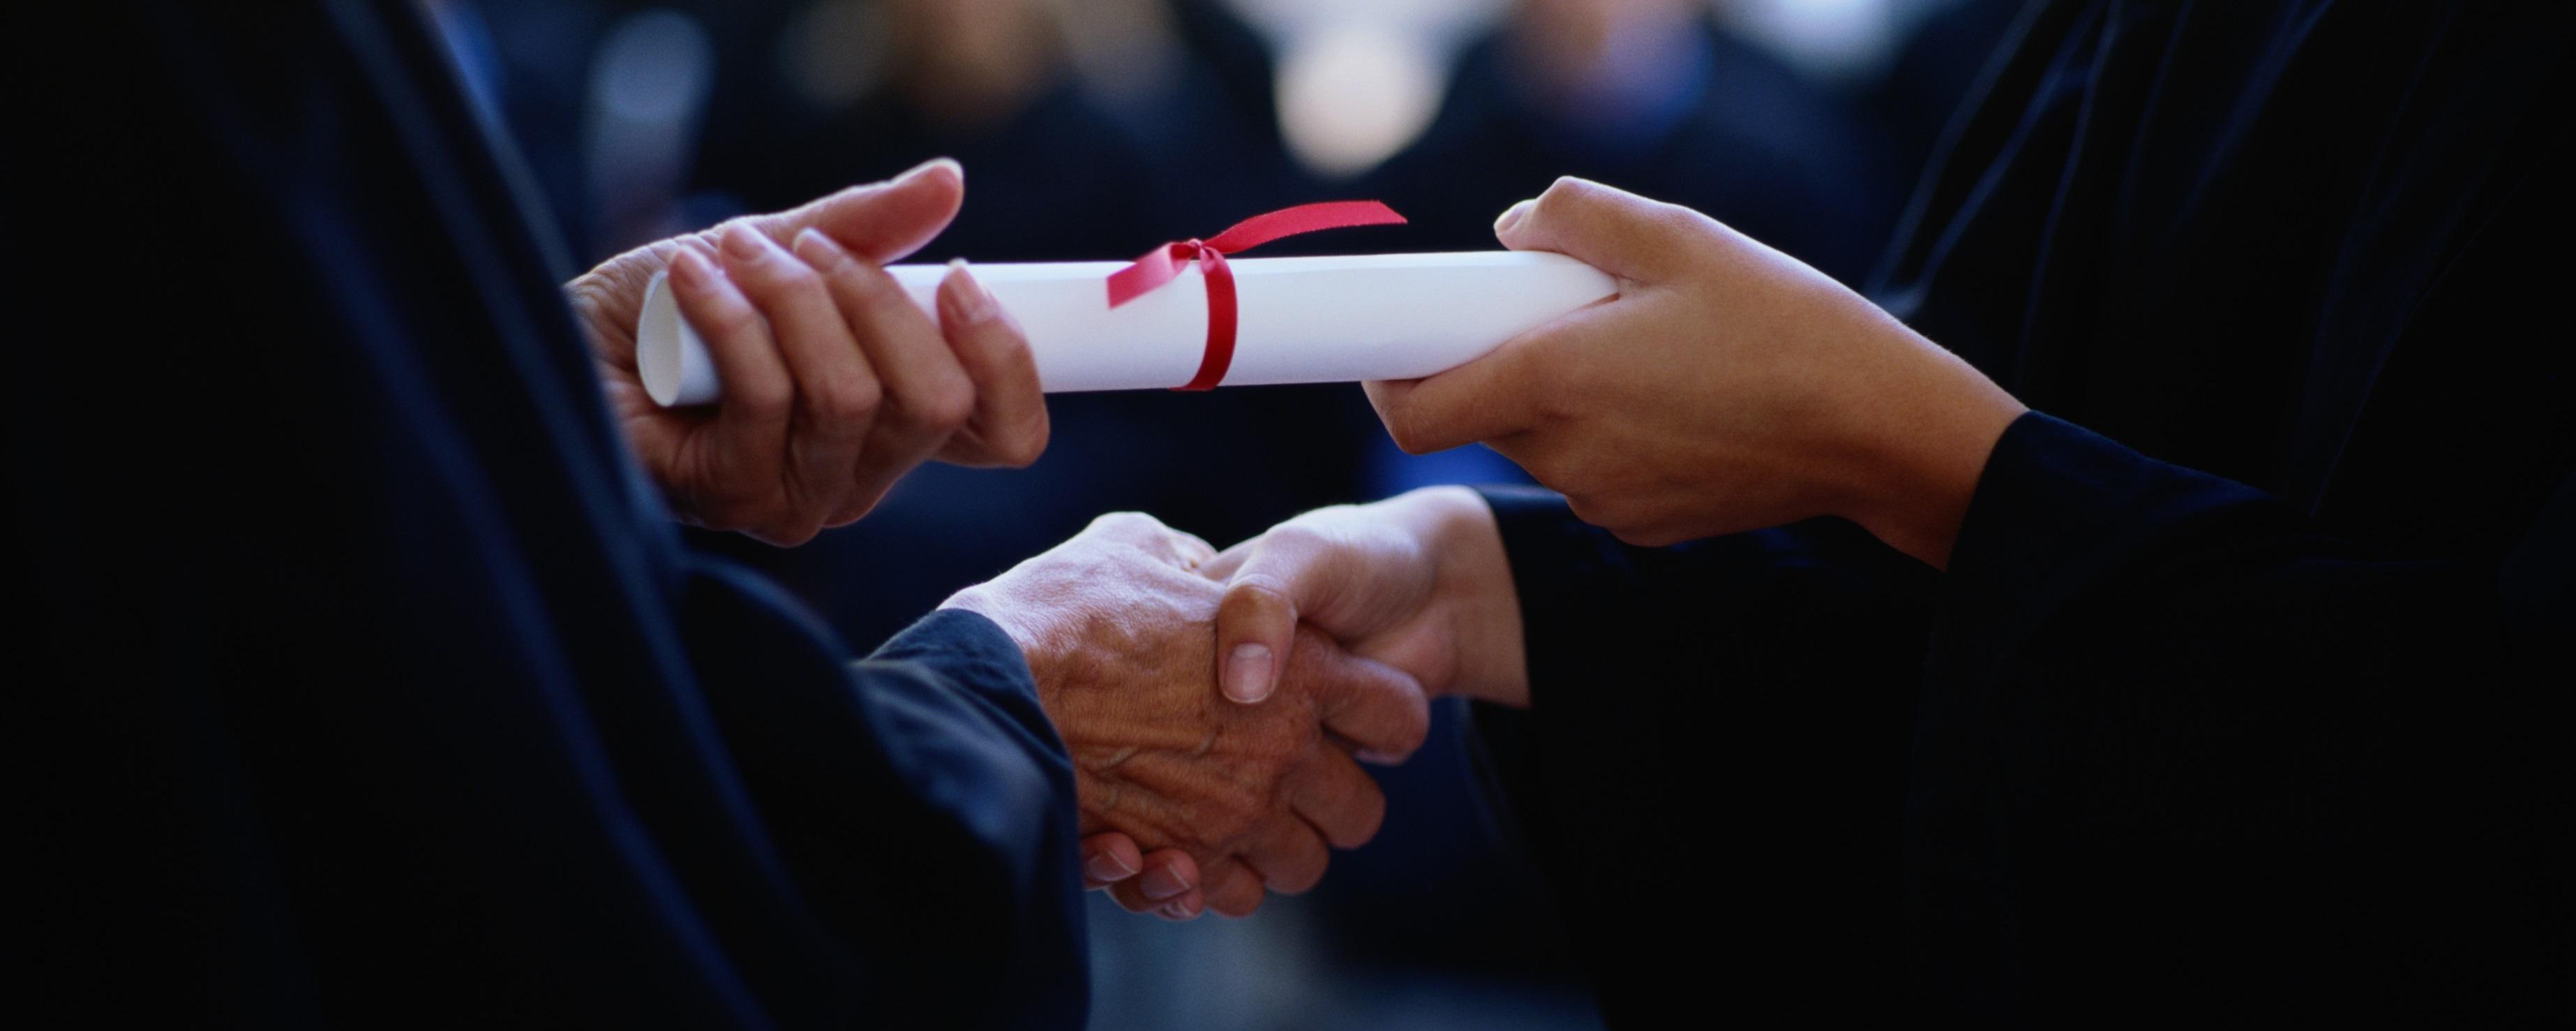 Graduate receiving a diploma, close-up of hands